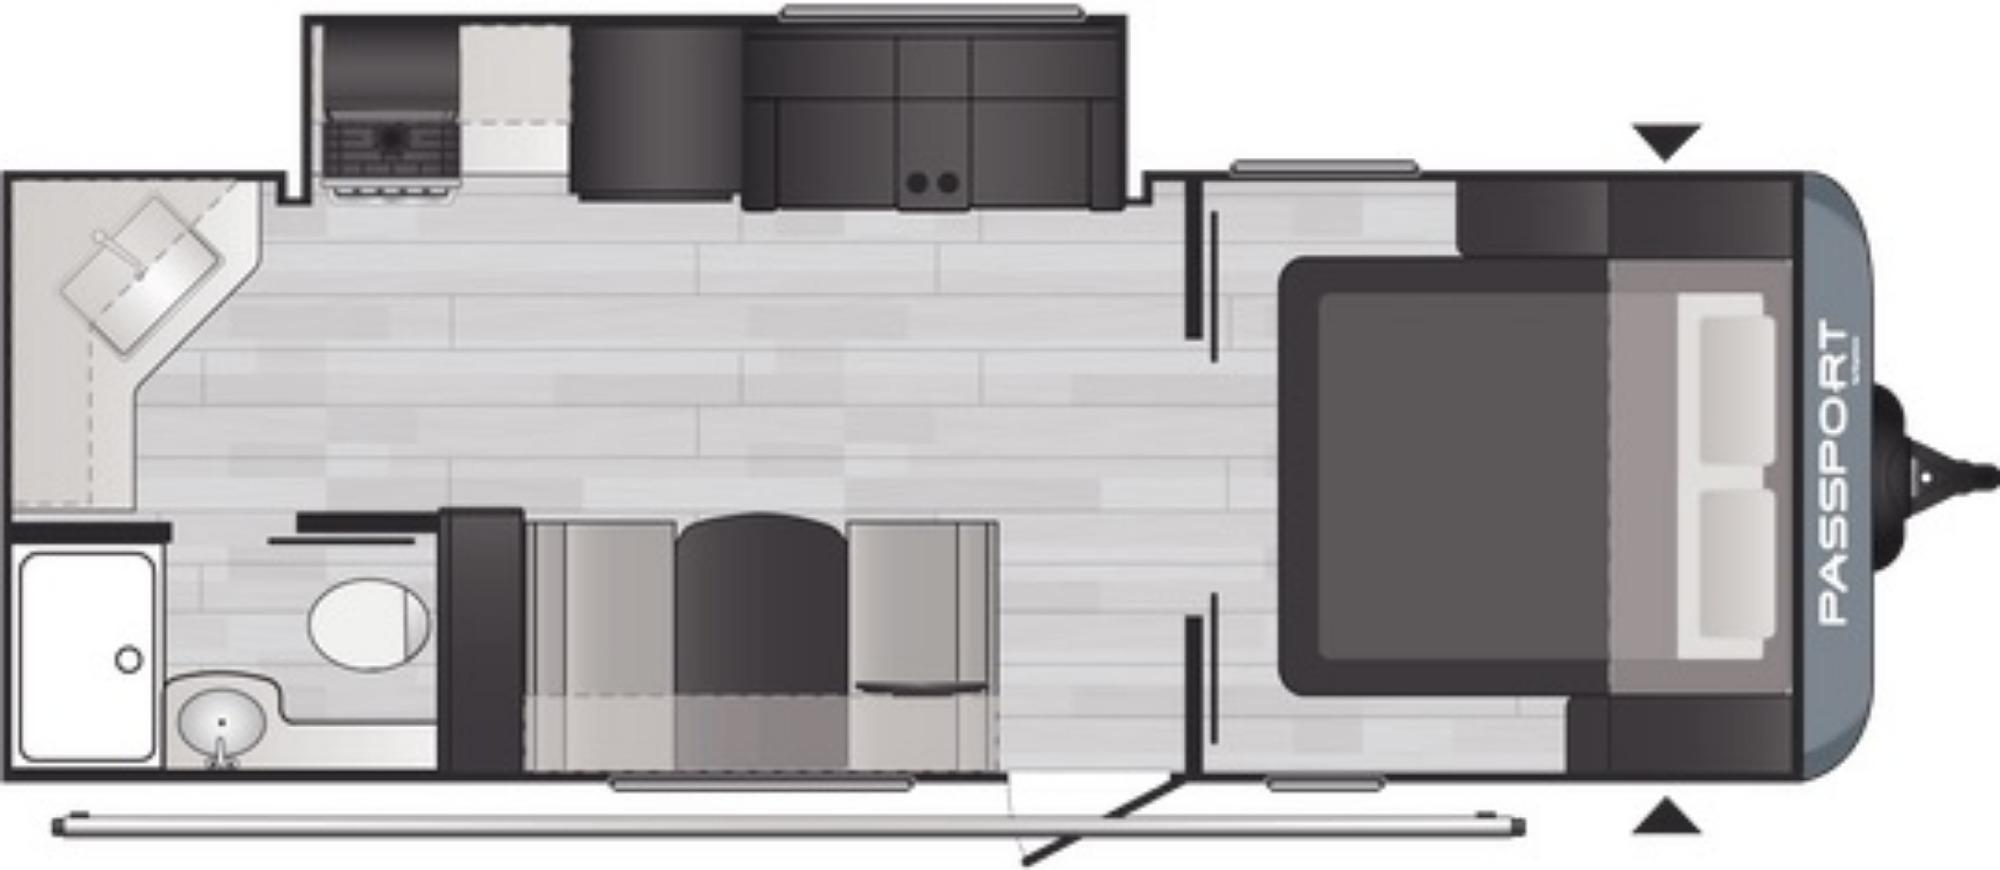 View Floor Plan for 2021 KEYSTONE PASSPORT 229RKWE